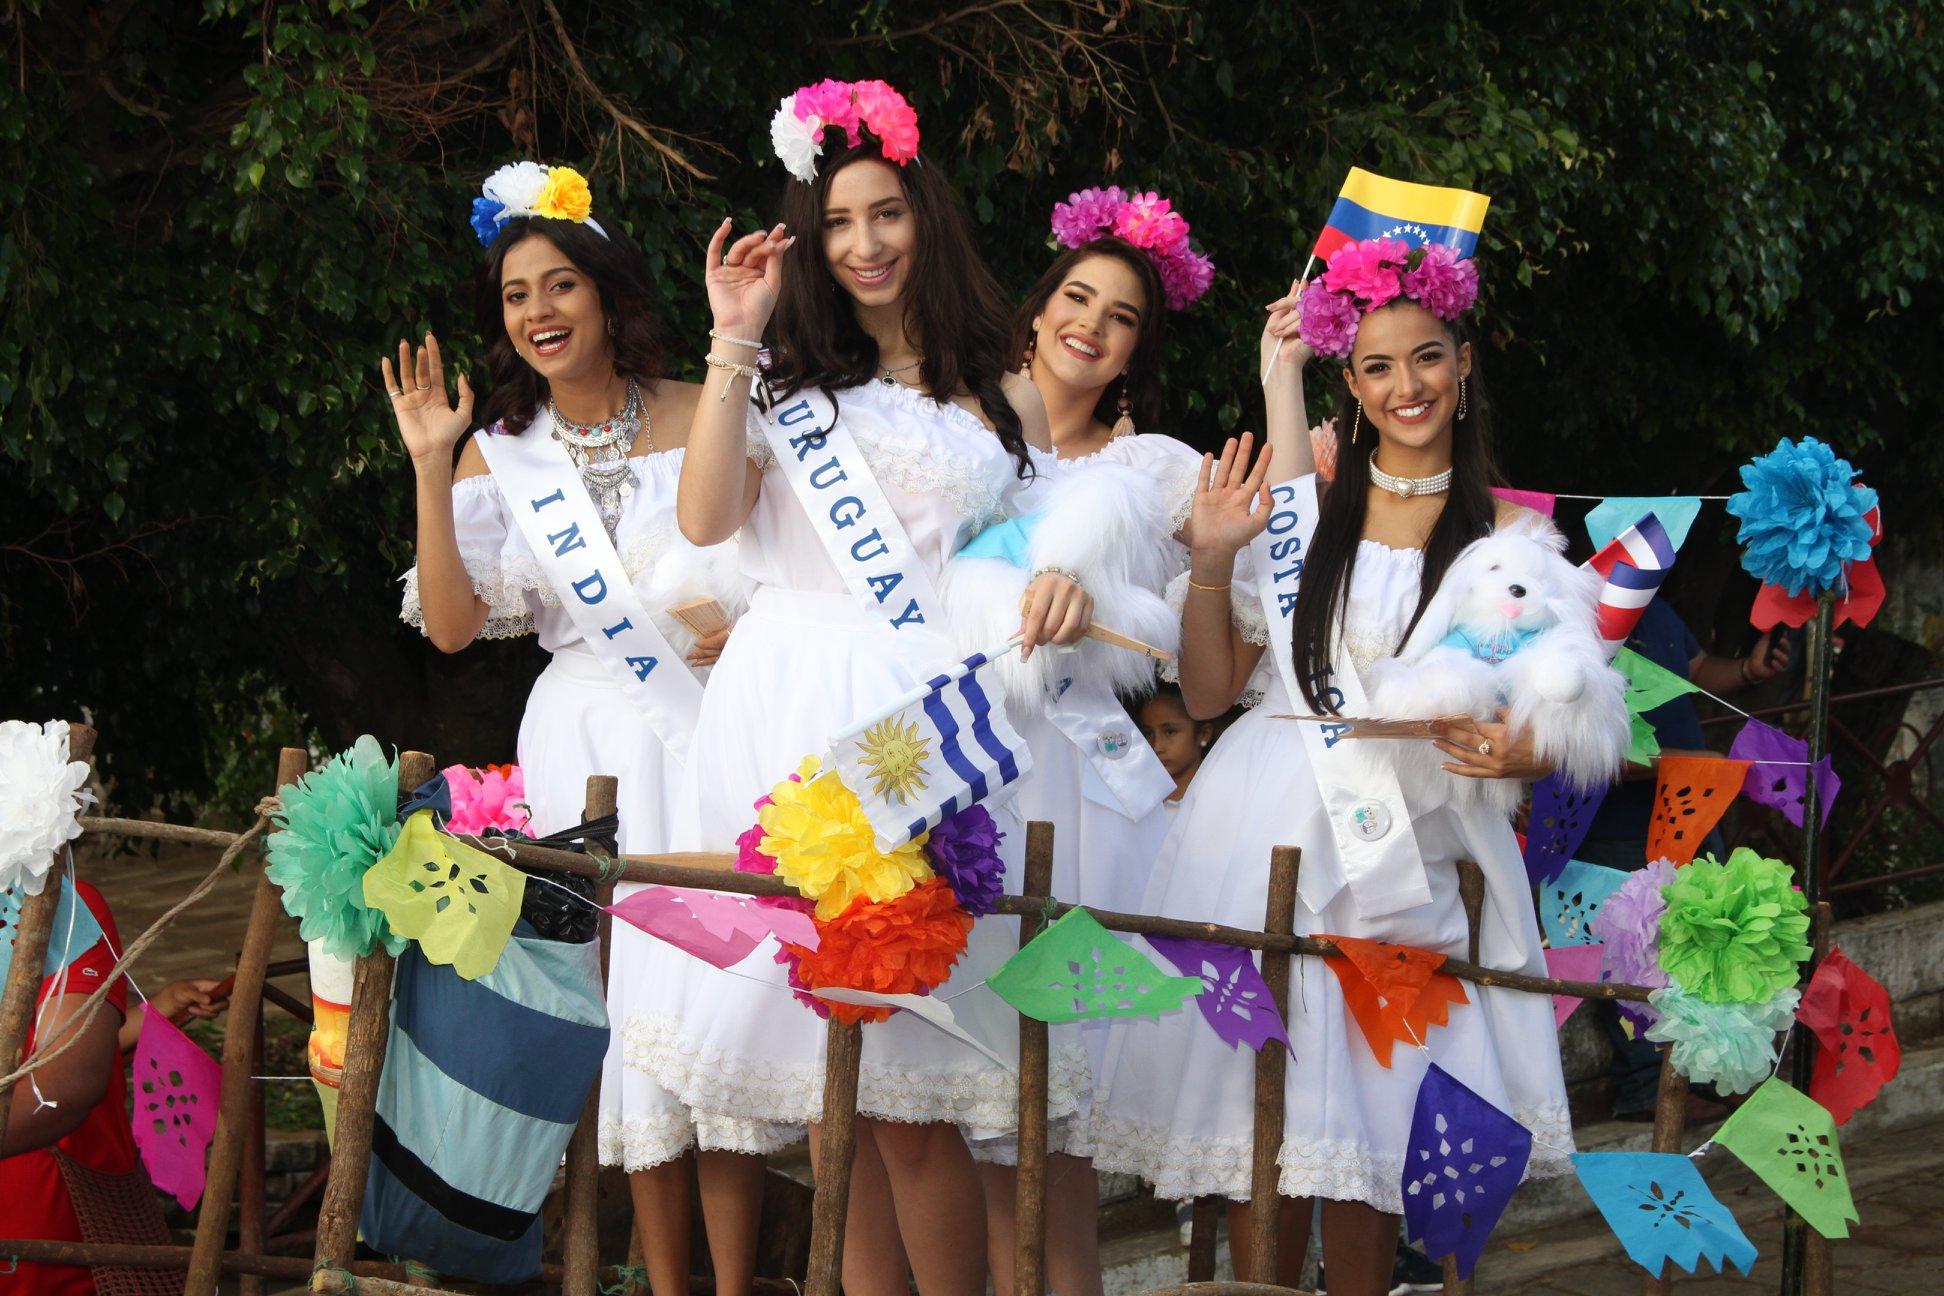 daniela di venere, top 12 de miss teen mundial 2019. - Página 4 60917410